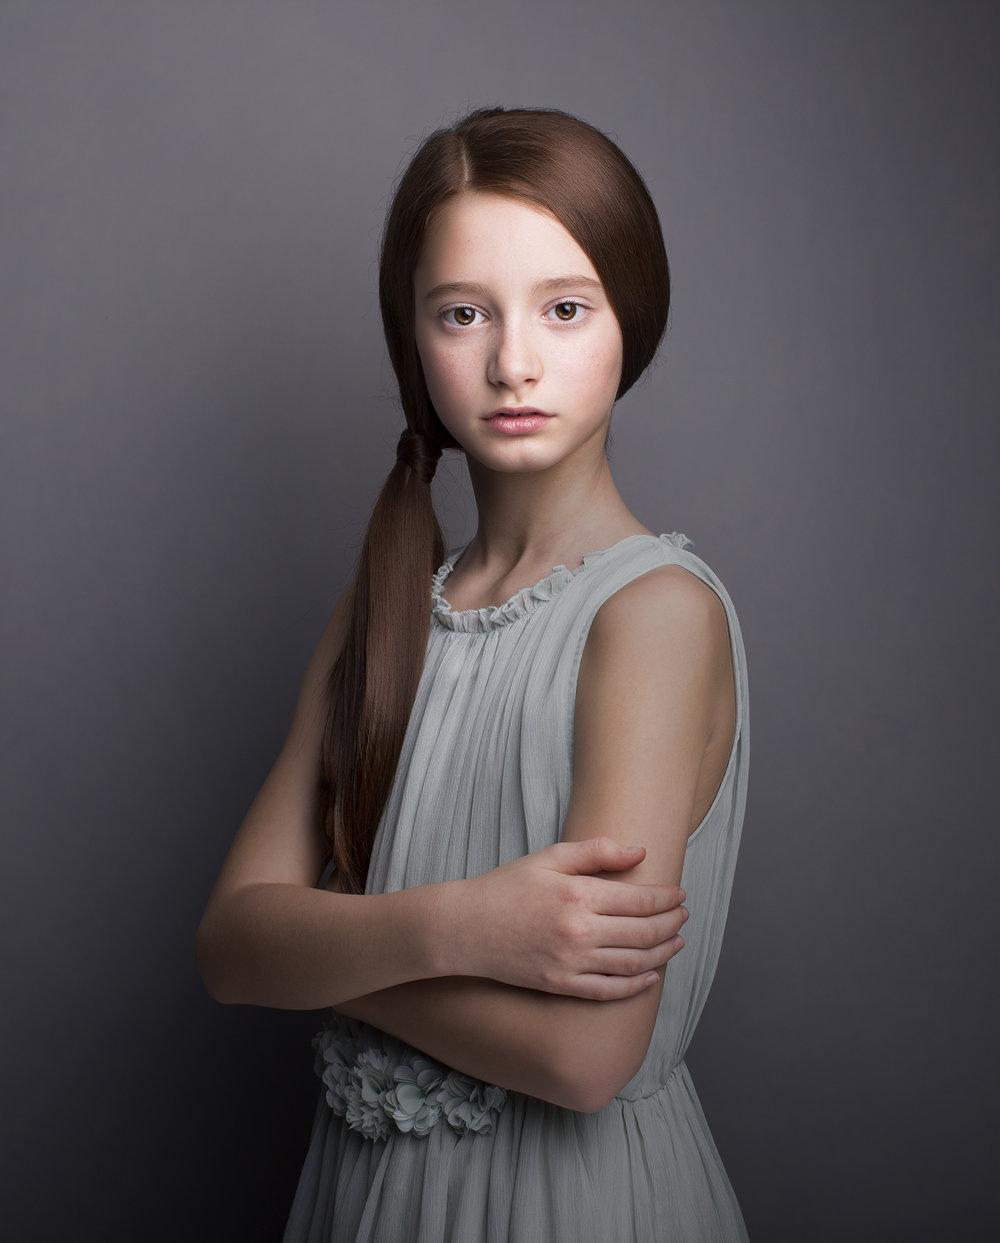 Elizabethg_fineart_portrait_photography_sadie_bruceandbrown_19_004.jpg